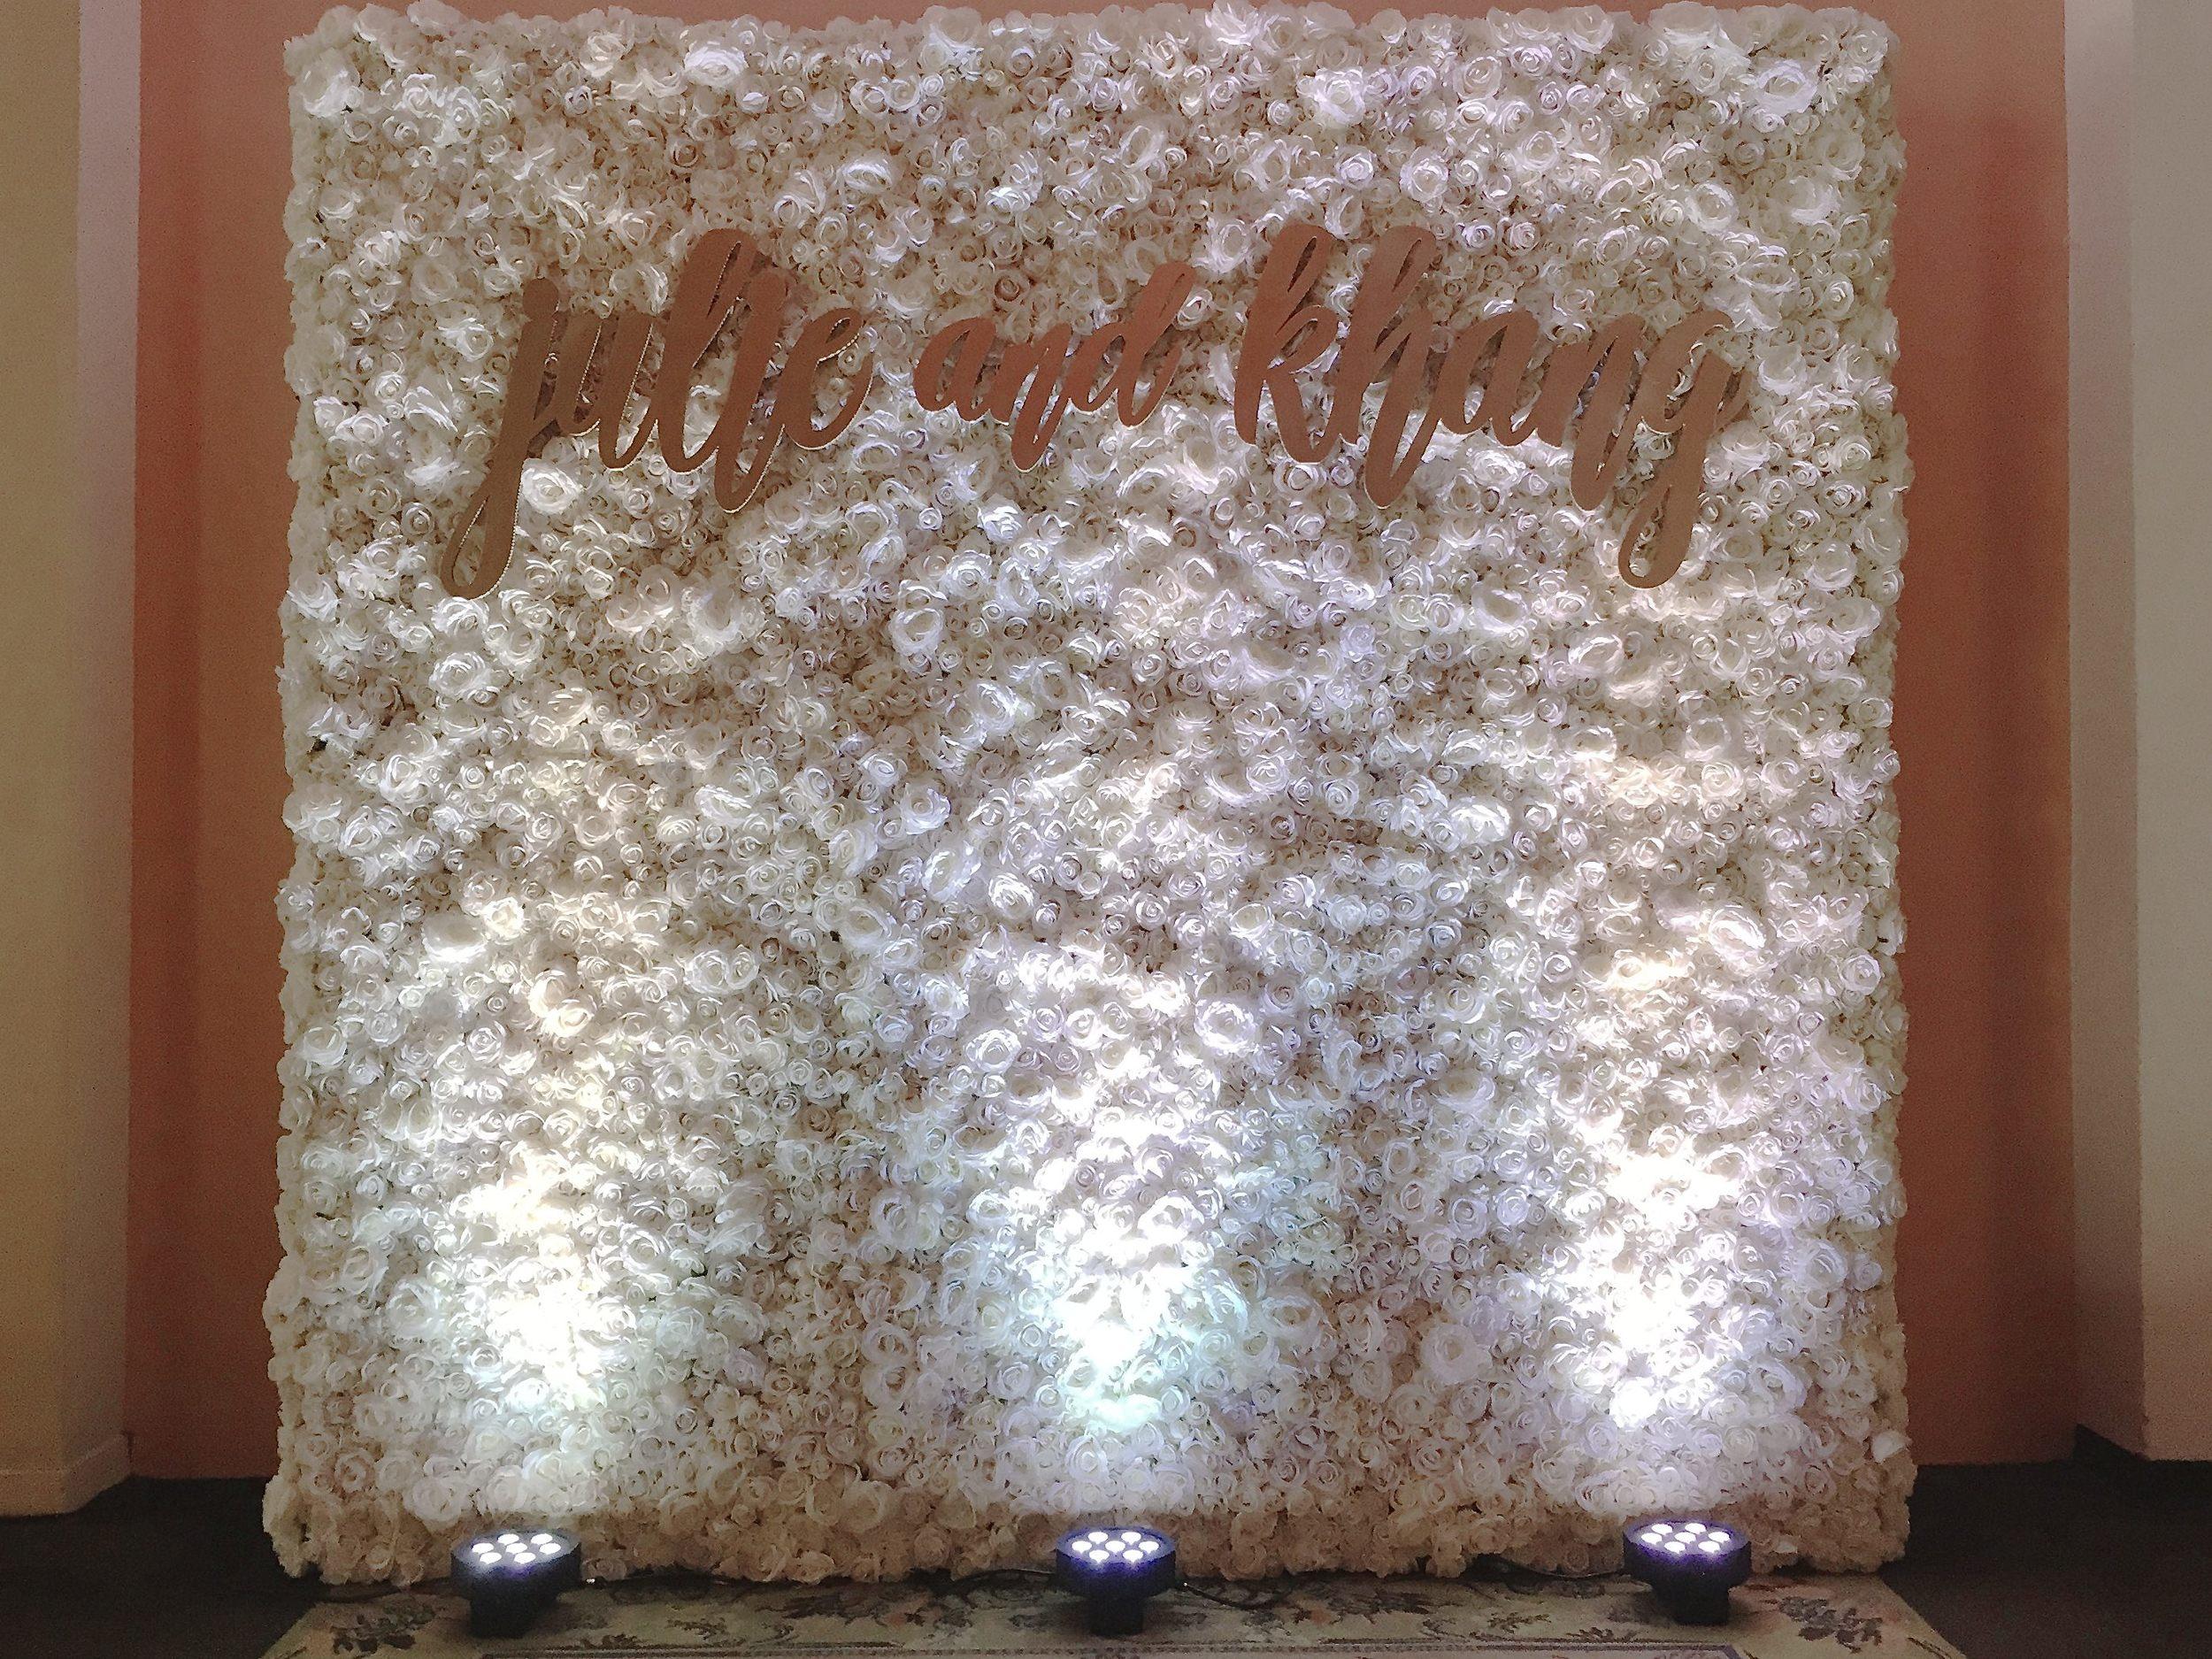 Curate-Julie-Khang-Illuminated-Rose-Wall.JPG